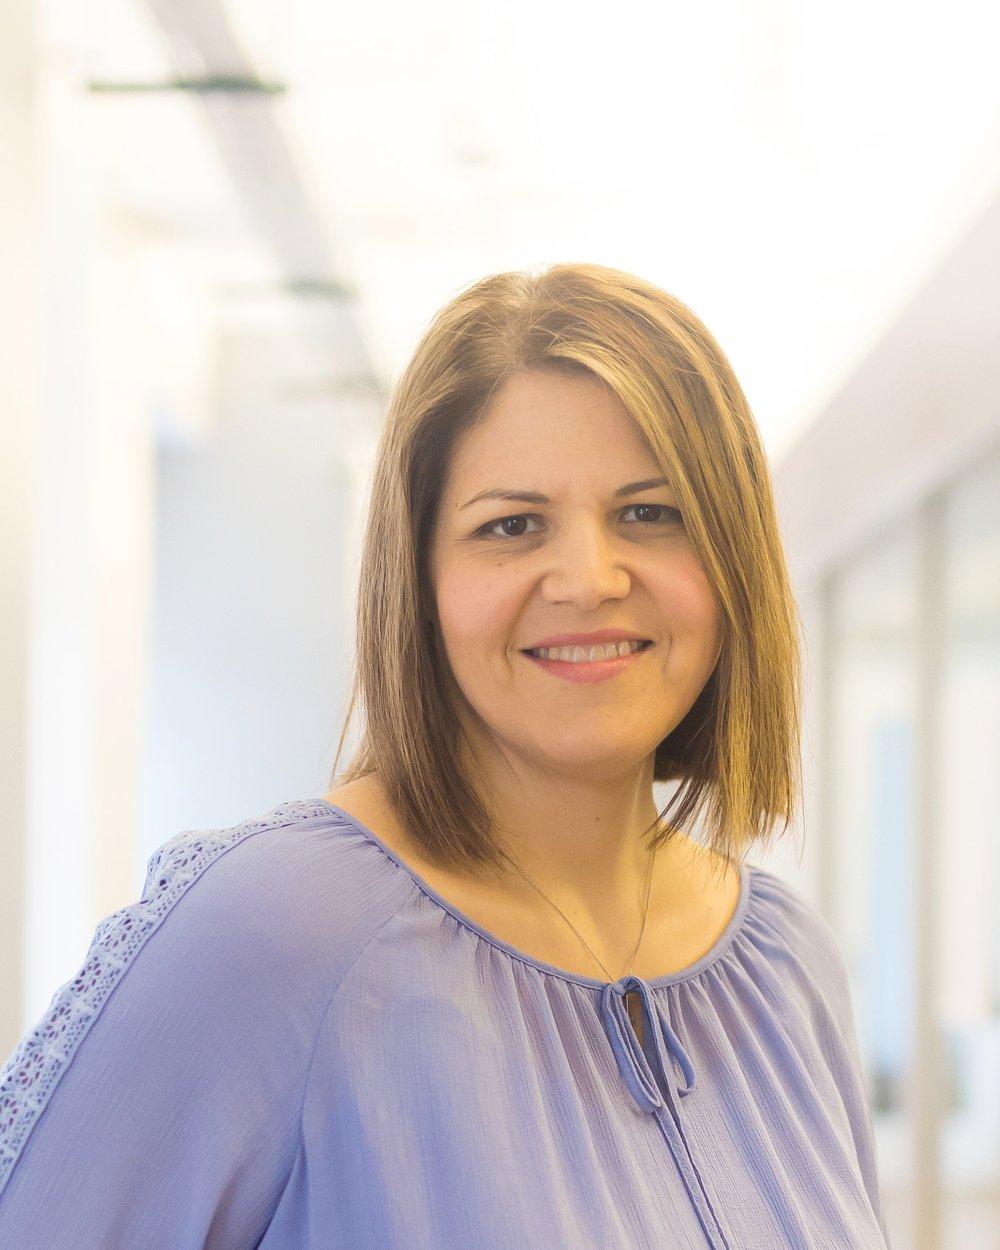 Vice President of Human Resources Joanna Zvirbulis